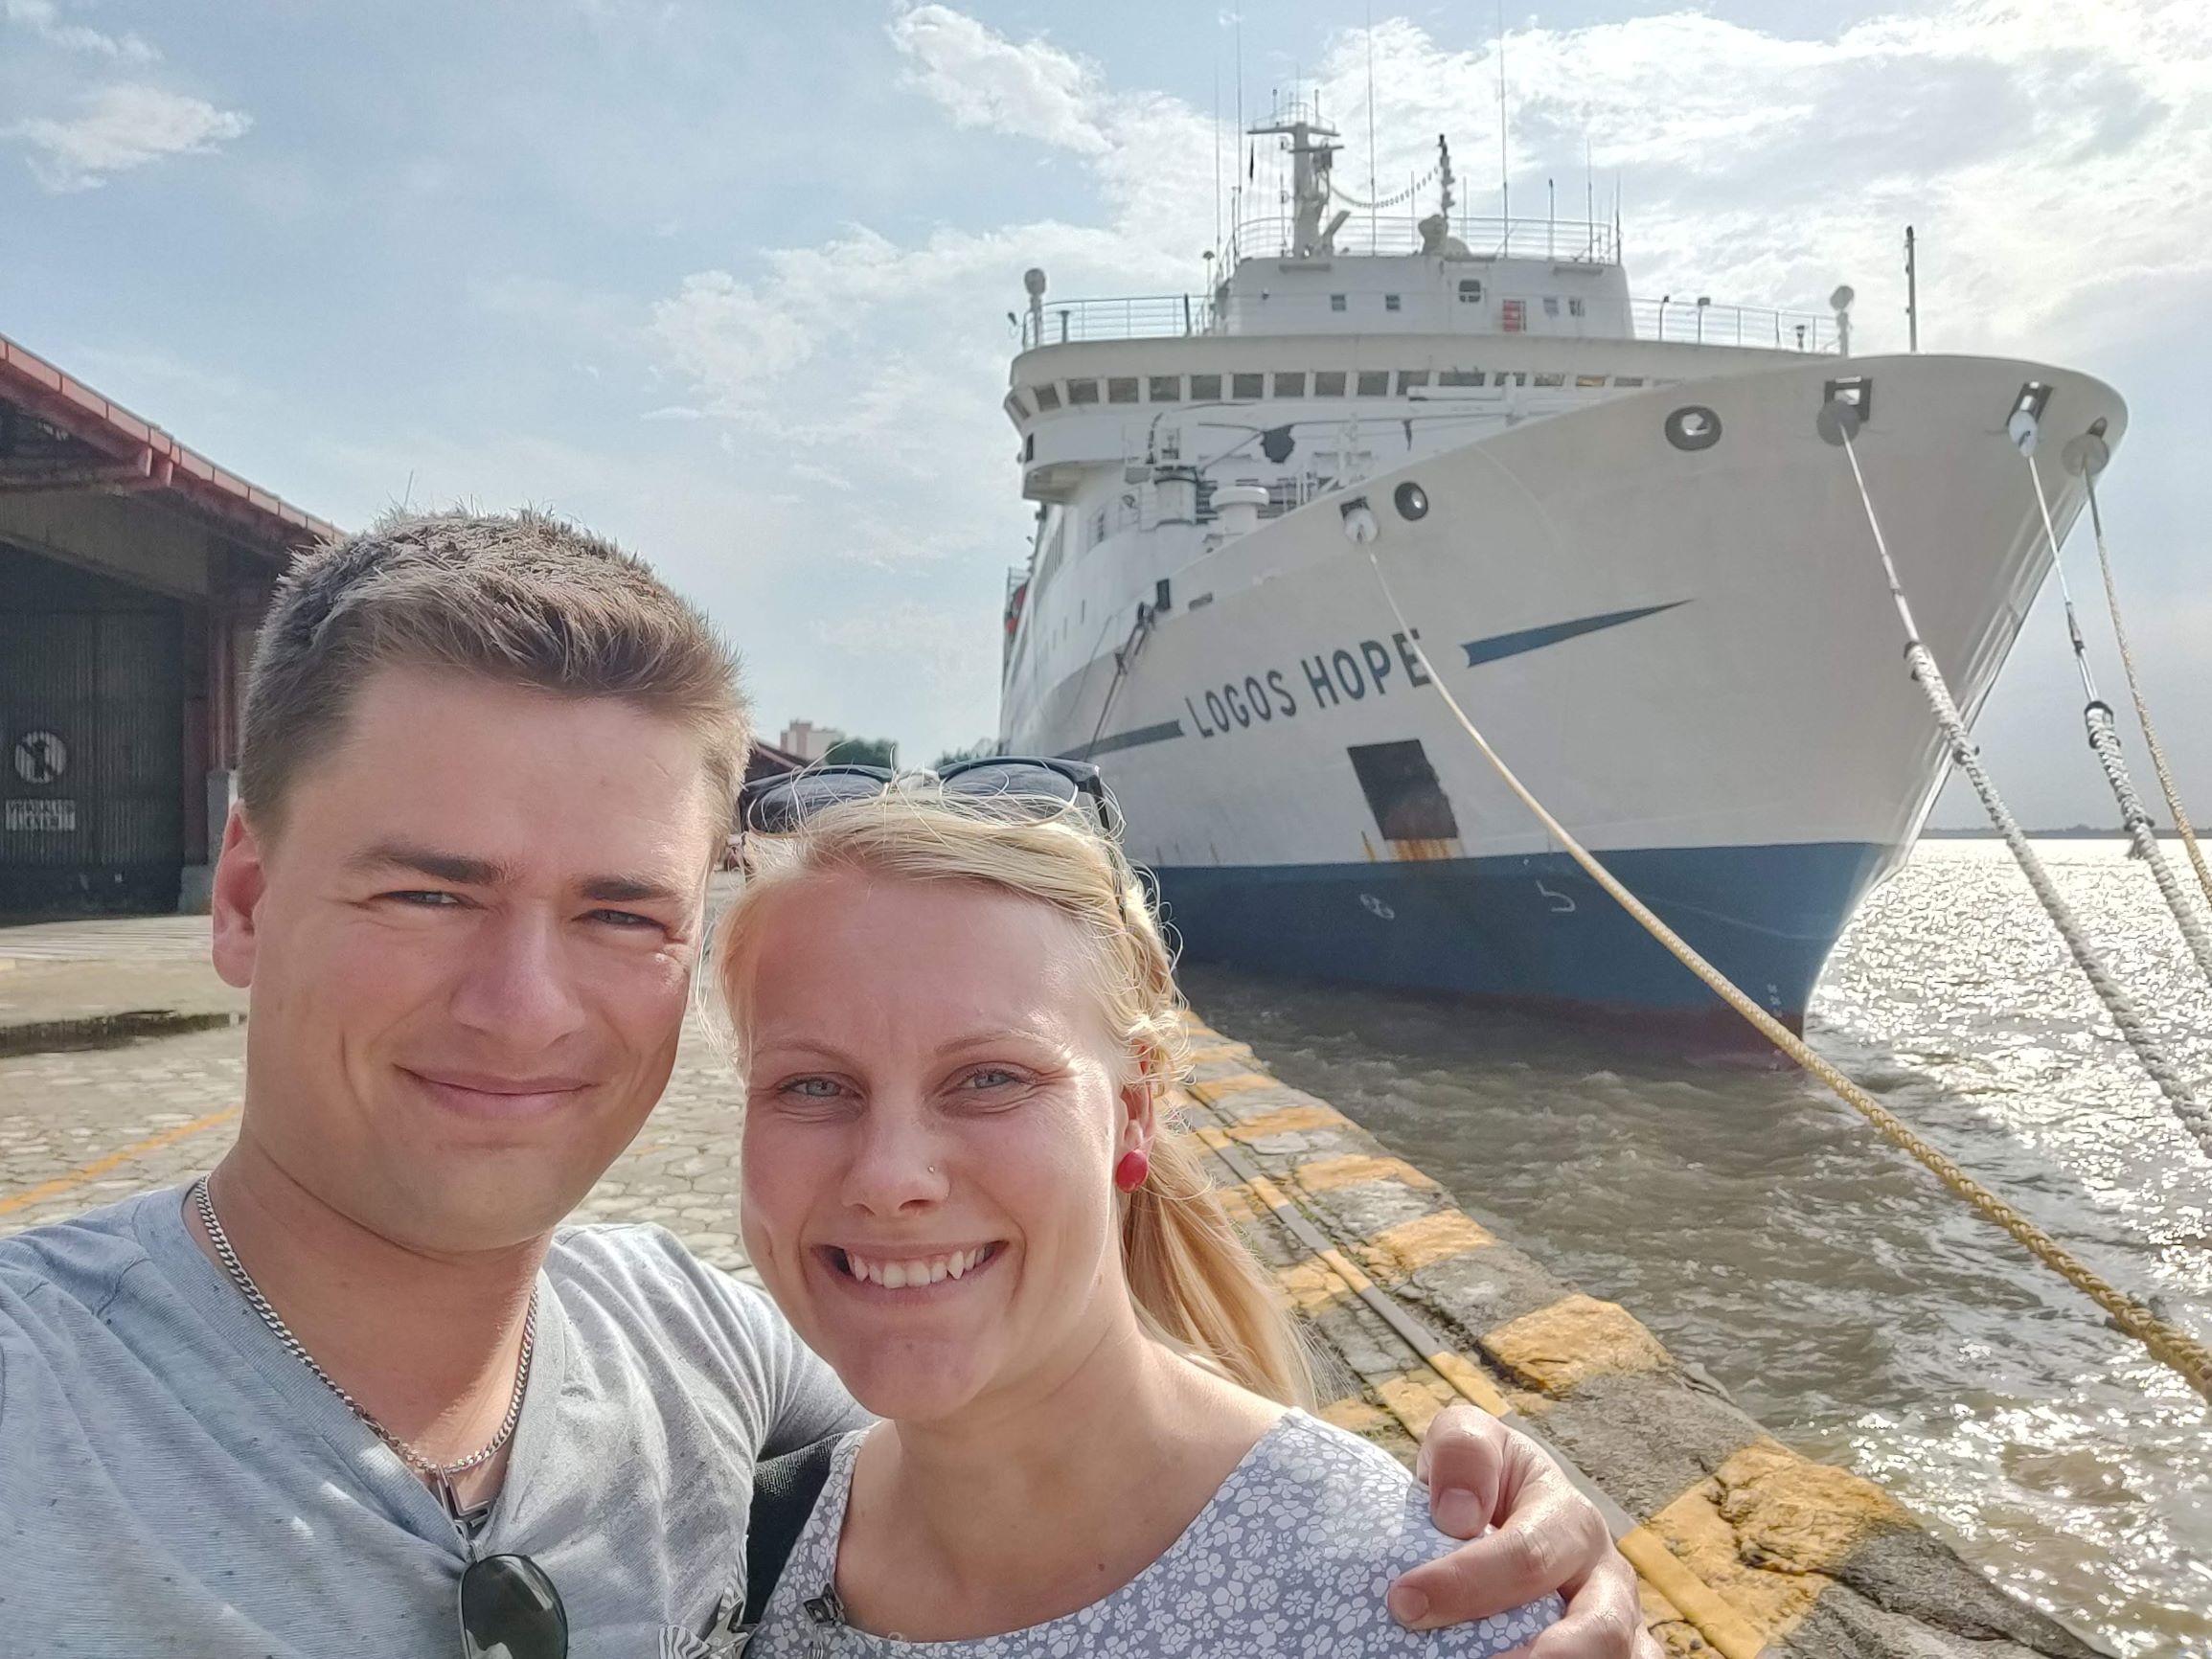 Madeleine og Mathias er snart på vej med Logos Hope